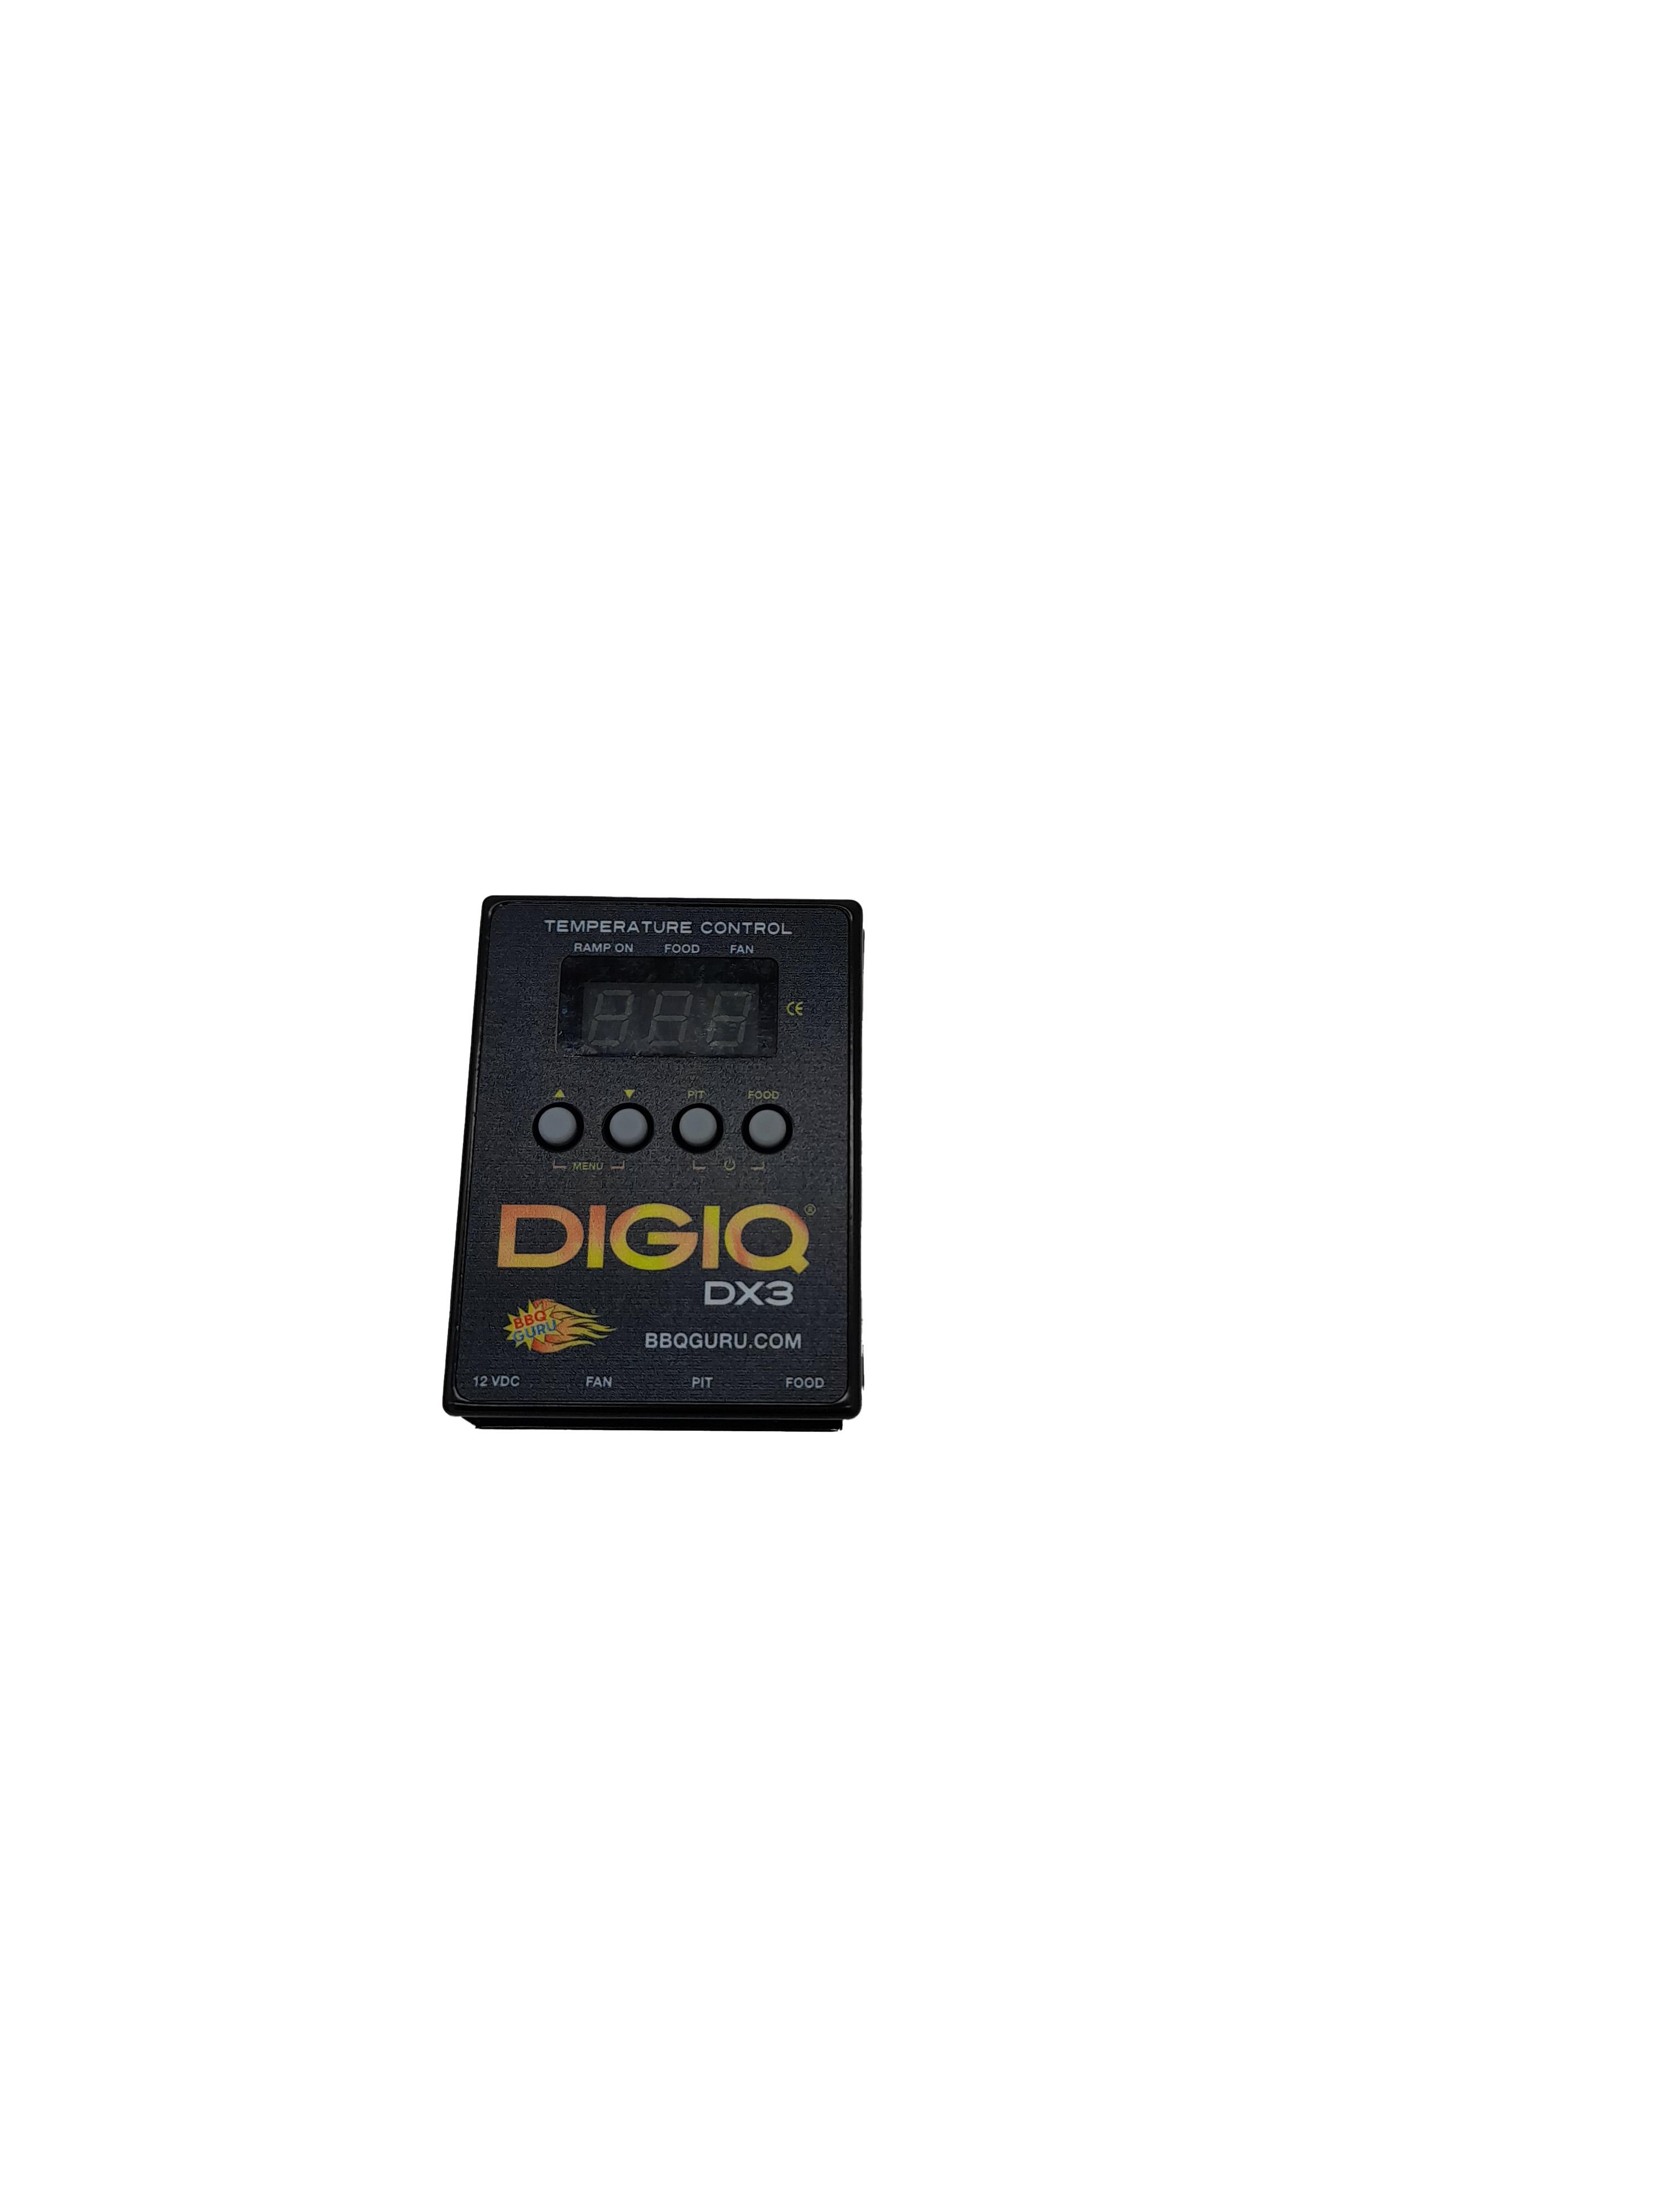 Monolith DigiQ DX3 - nur Controller